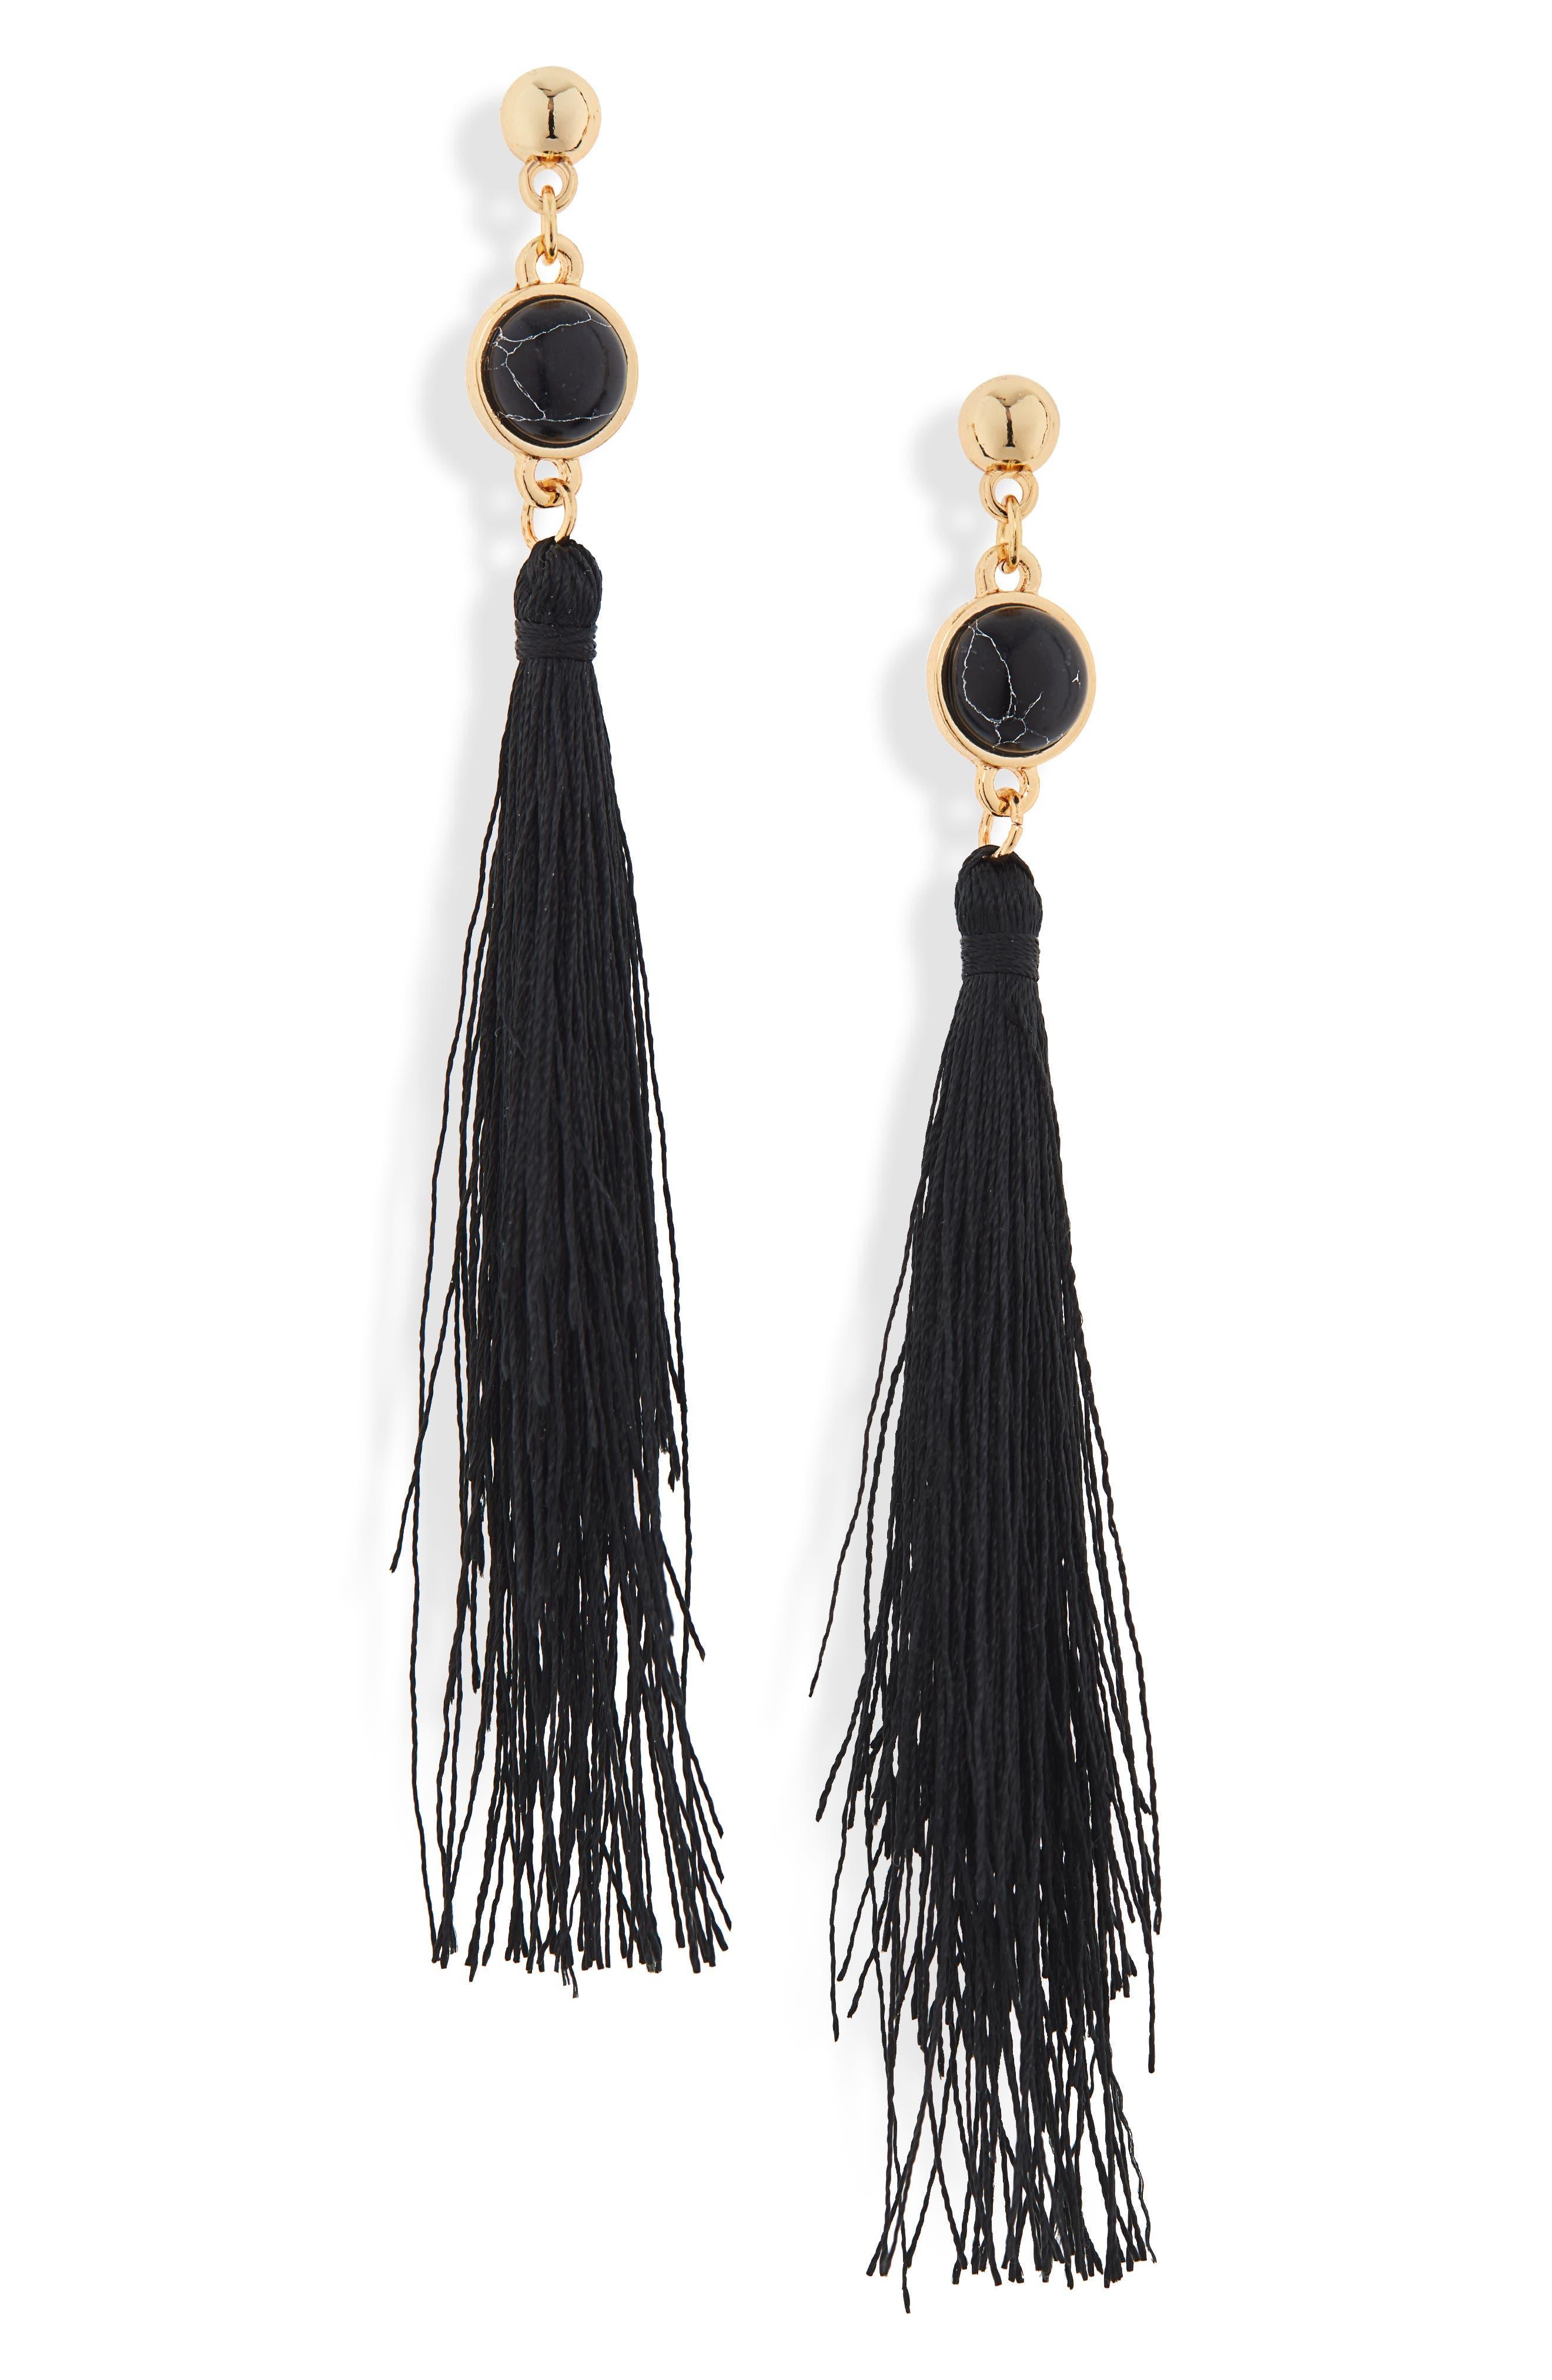 UNCOMMON JAMES BY KRISTIN CAVALLARI Strawberry Fields Jasper Tassel Earrings, Main, color, BLACK